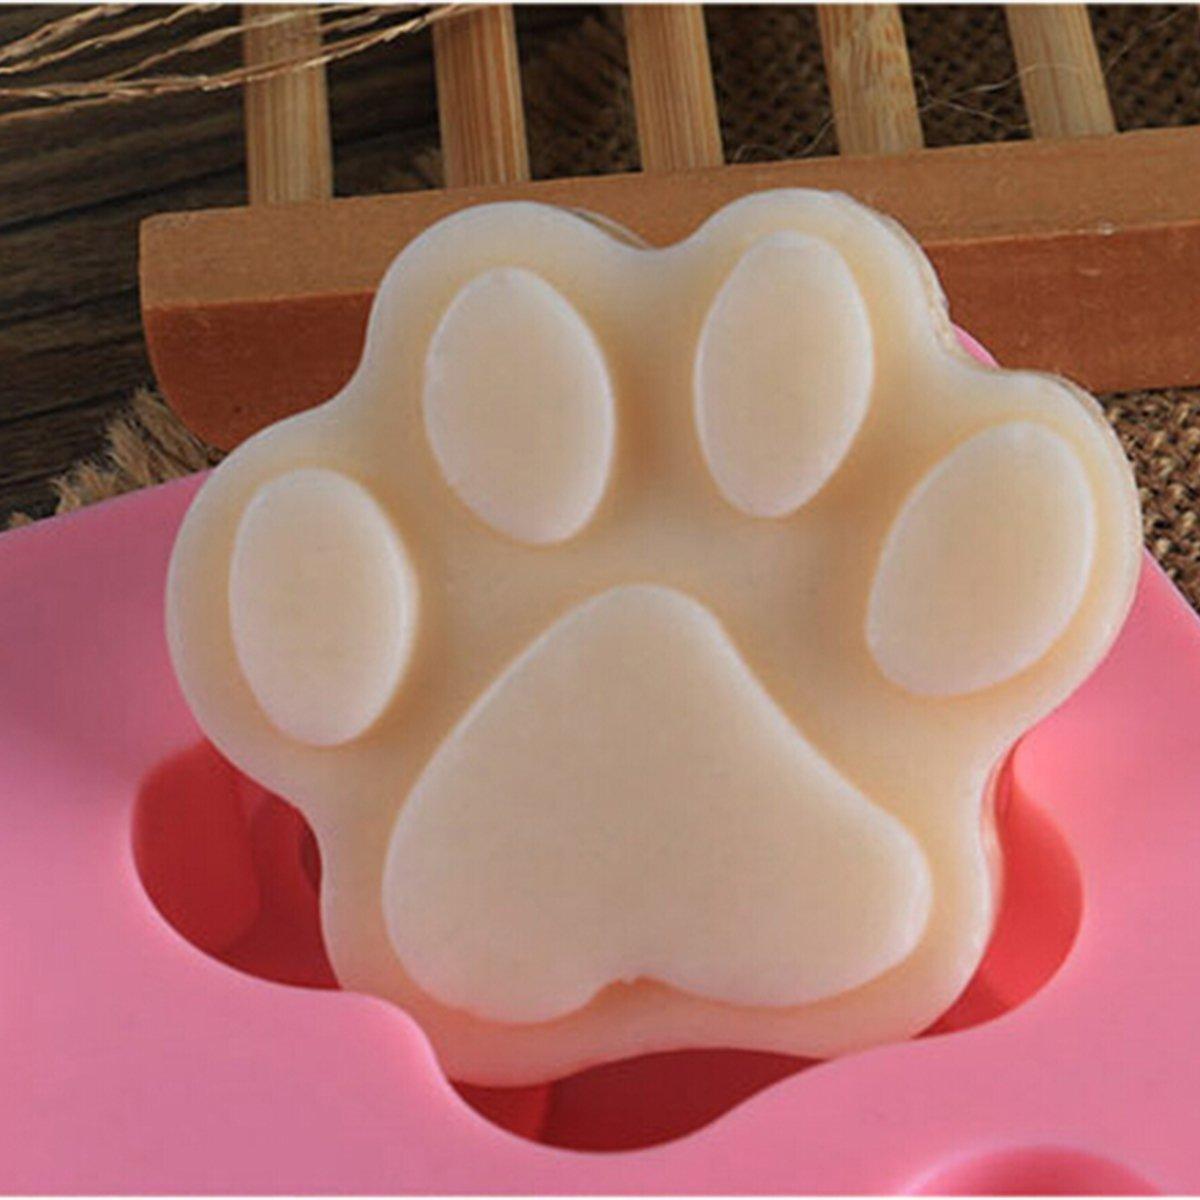 bouti1583 Cat Paw Charlotte Pastel Hornear Molde de silicona con 6 Cavidades: Amazon.es: Hogar